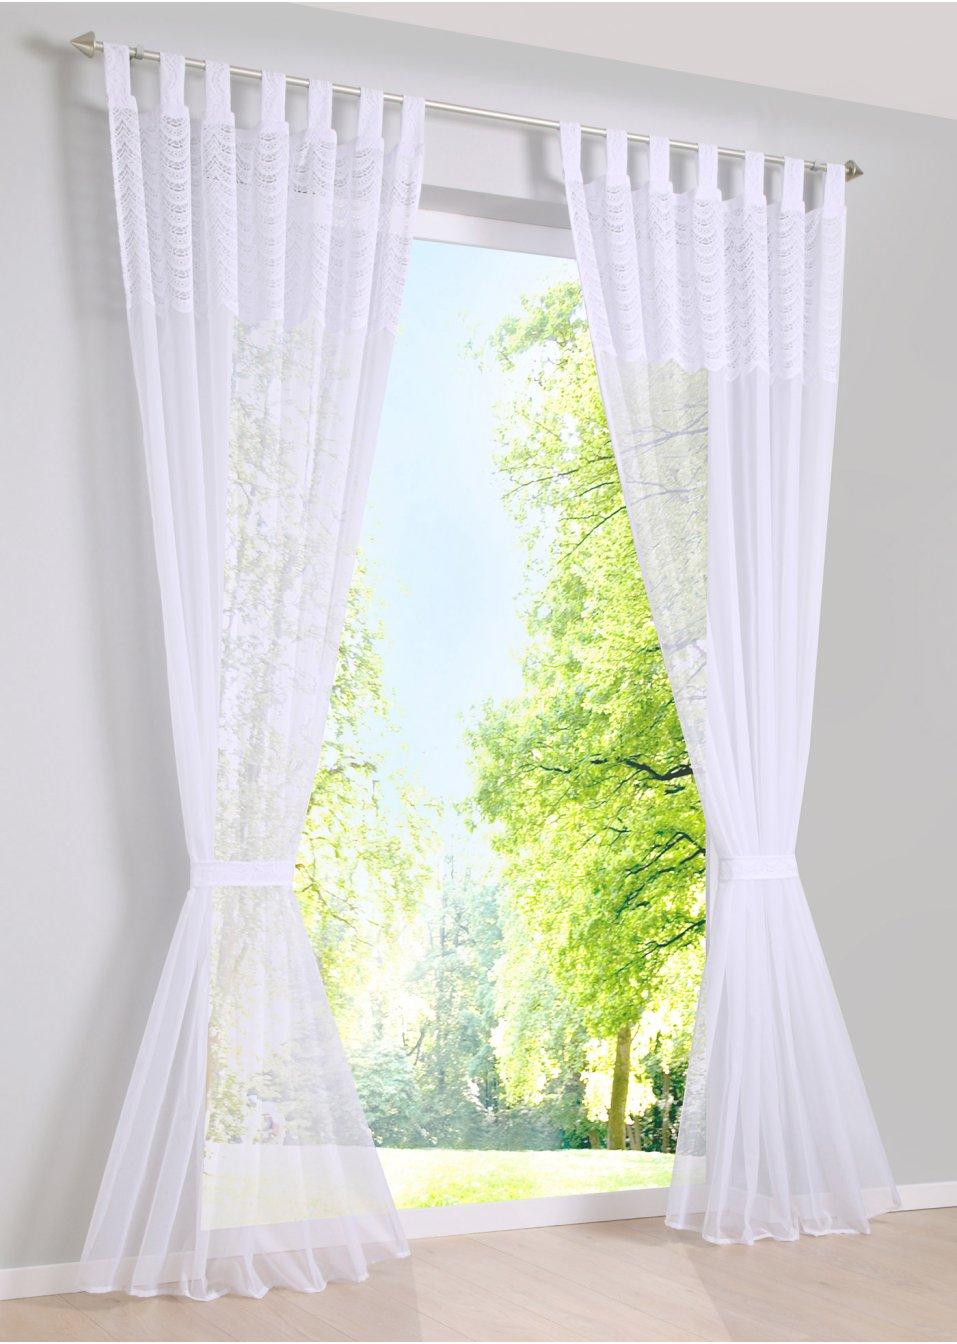 gardine darina 1er pack weiss bpc living online kaufen. Black Bedroom Furniture Sets. Home Design Ideas